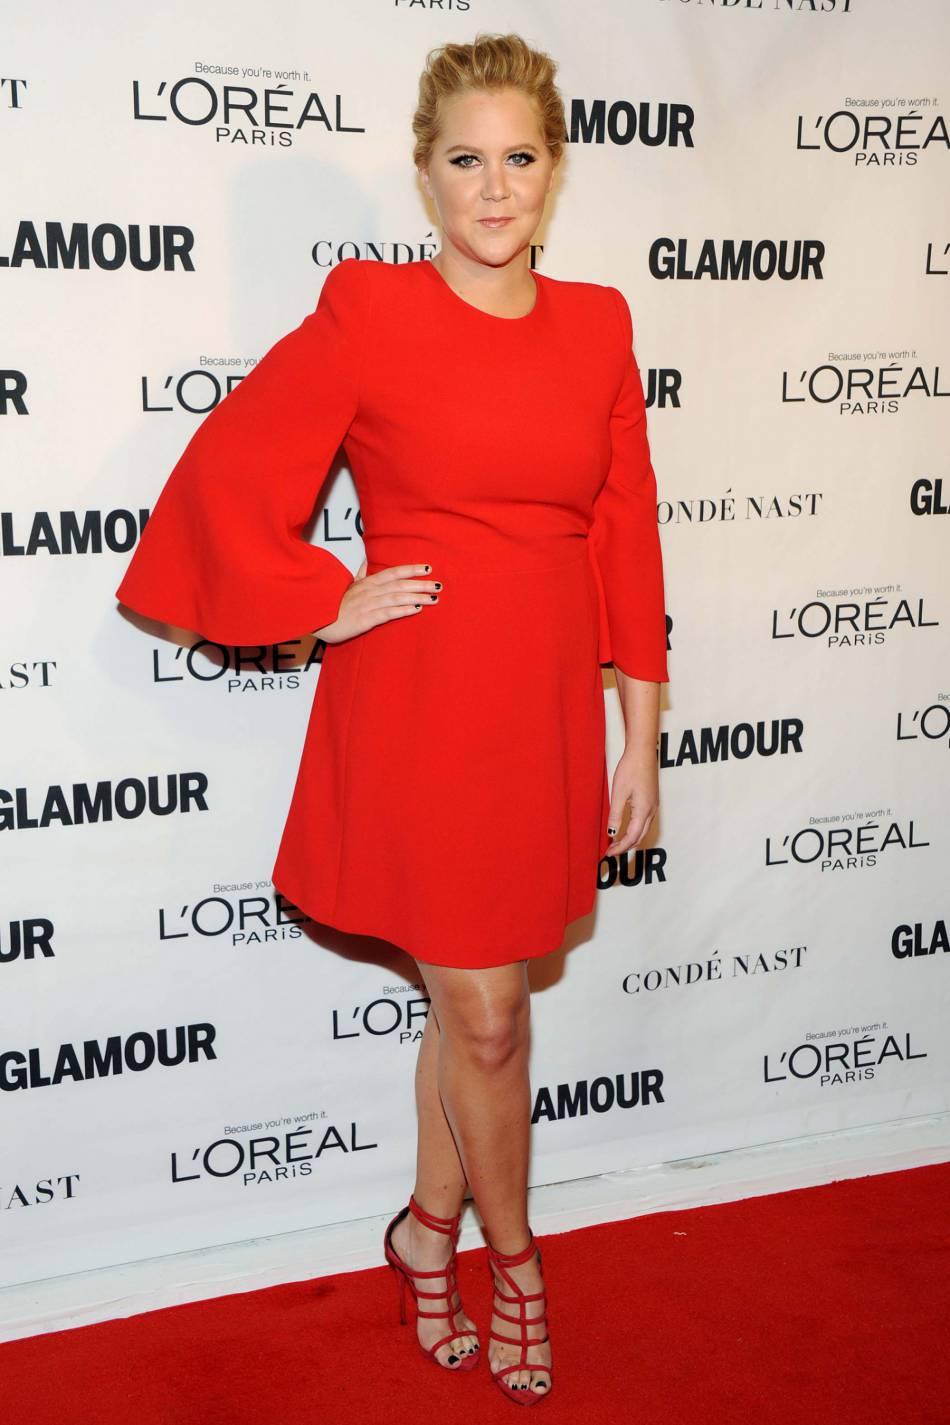 Amy Schumer porte une robe Alexander McQueen et des sandales Giuseppe Zanotti Design aux Glamour Awards le 9 novembre 2015 à New York.